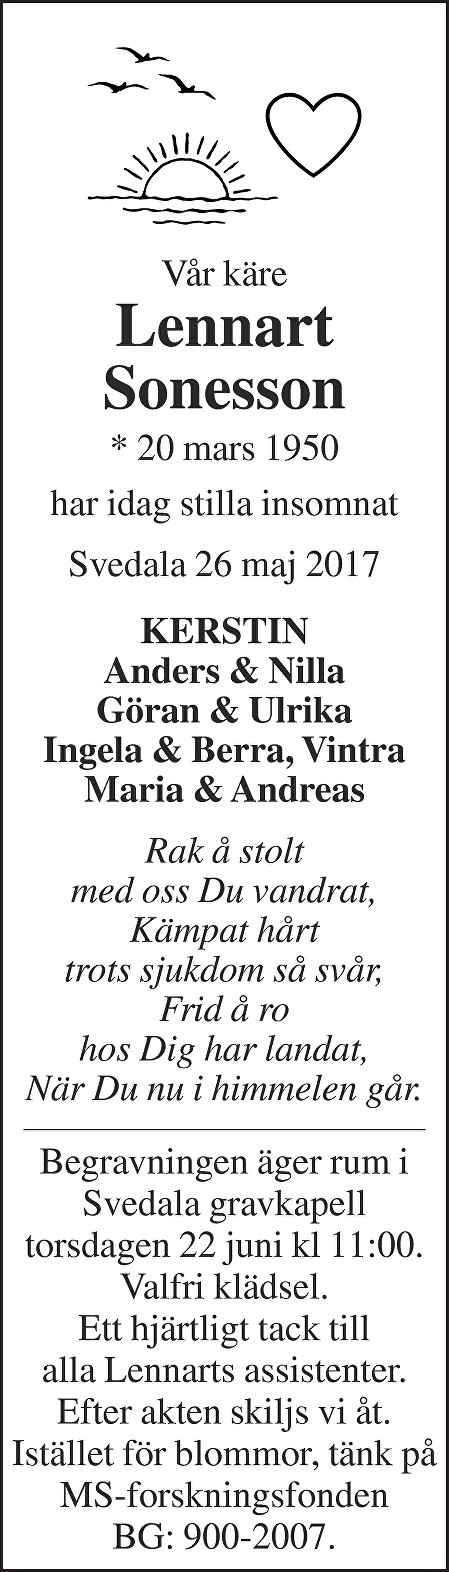 Lennart Sonesson Death notice